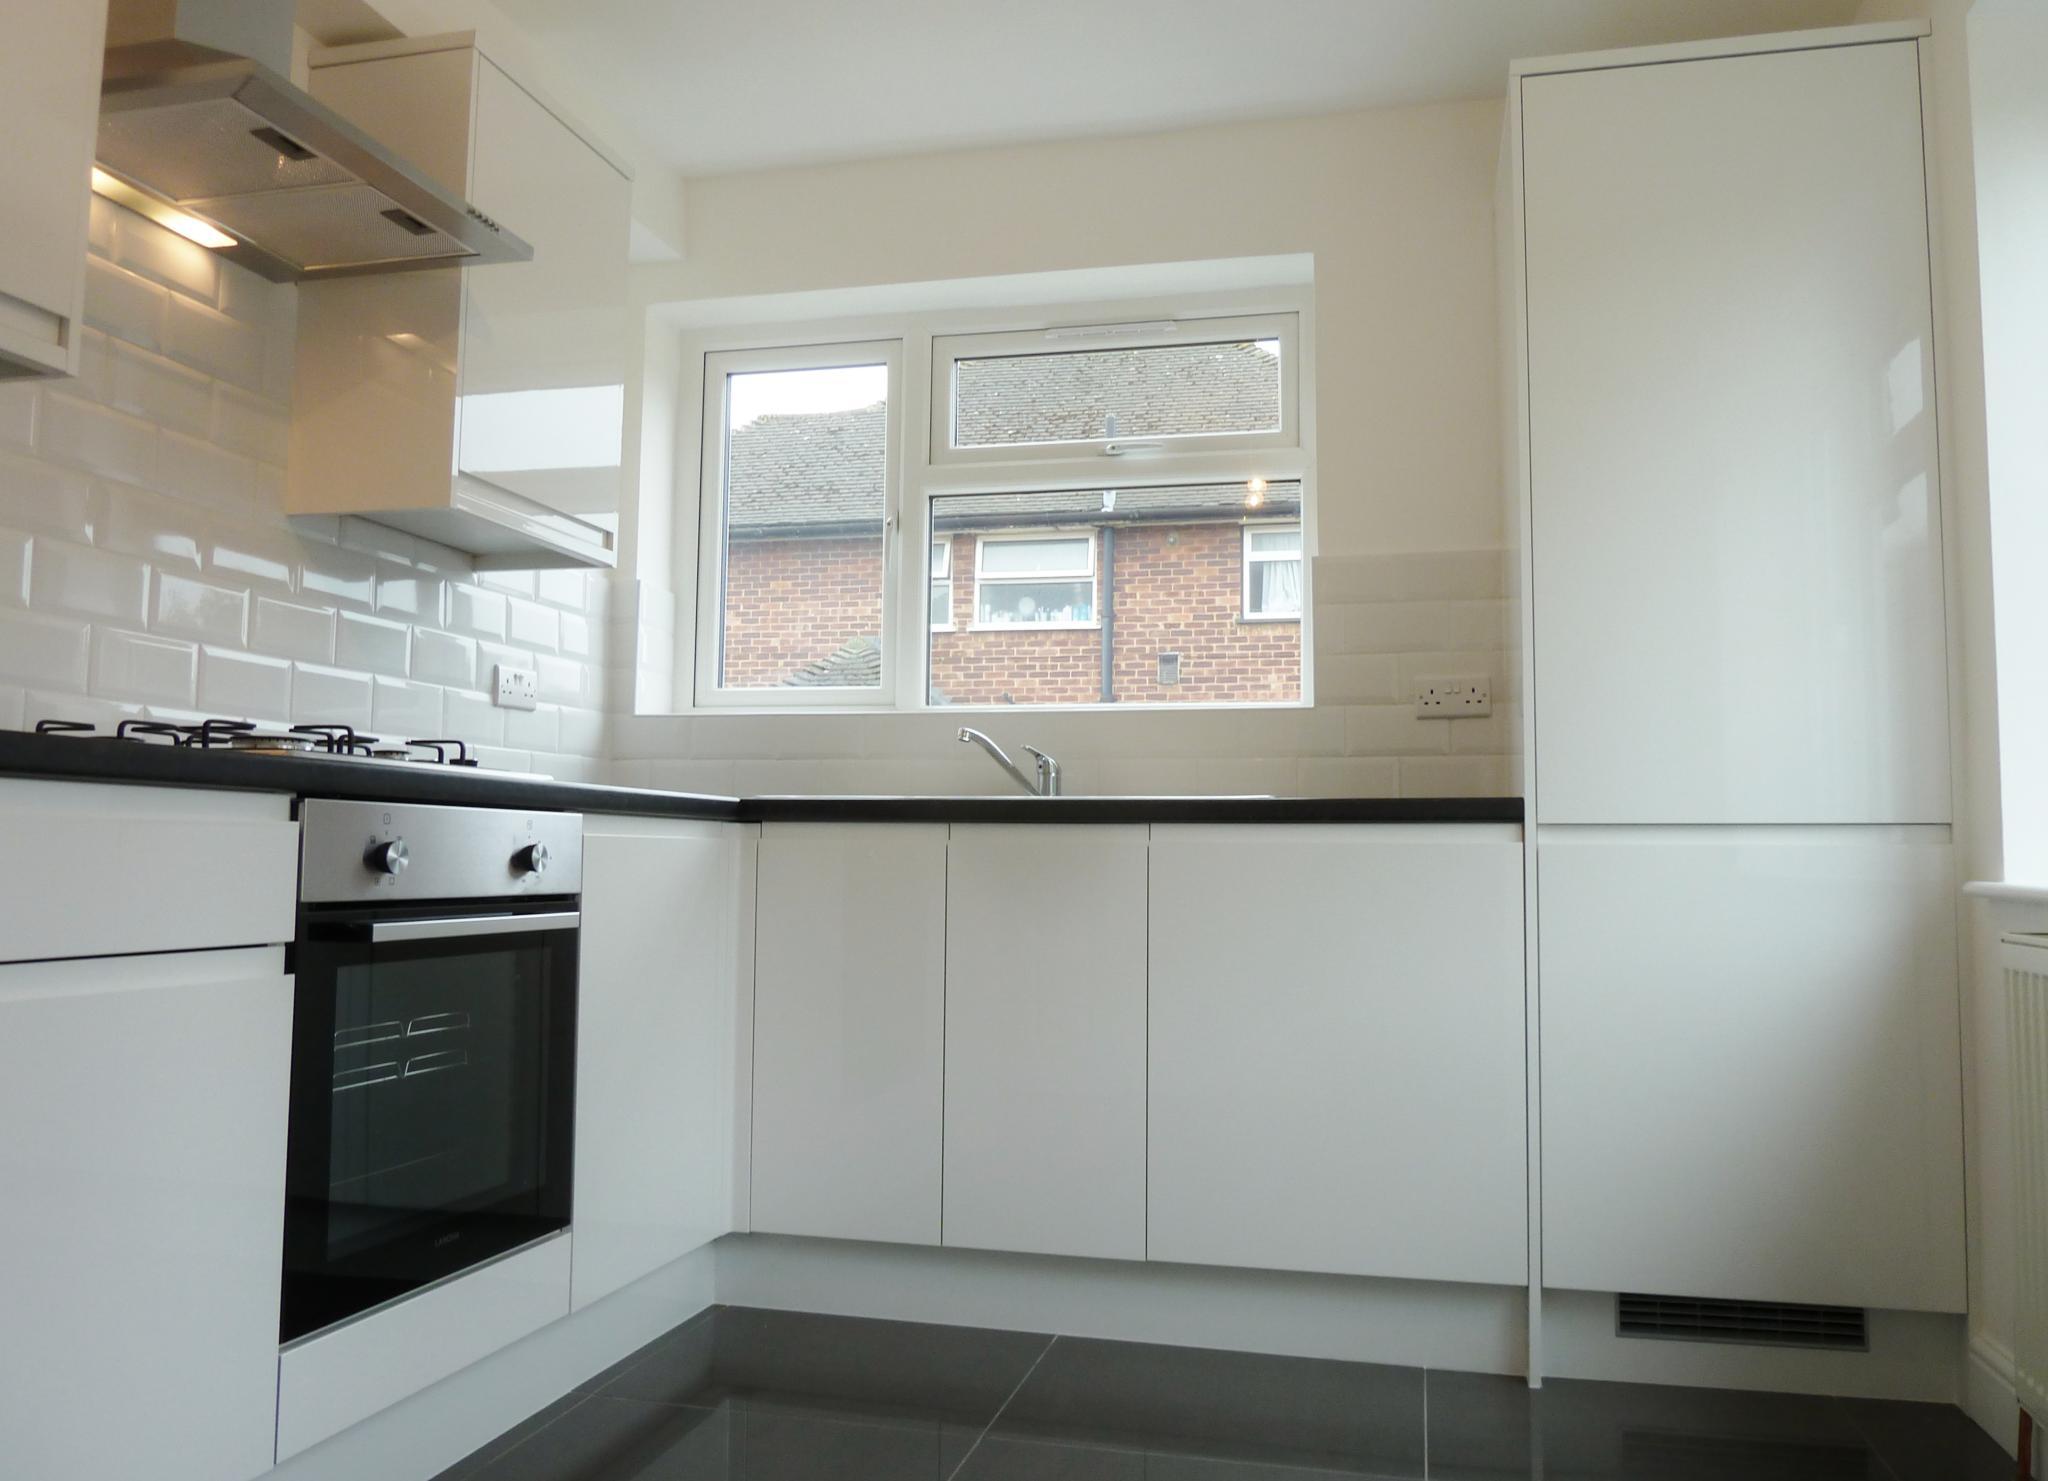 2 bedroom ground floor maisonette flat/apartment To Let in Edgware - Kitchen